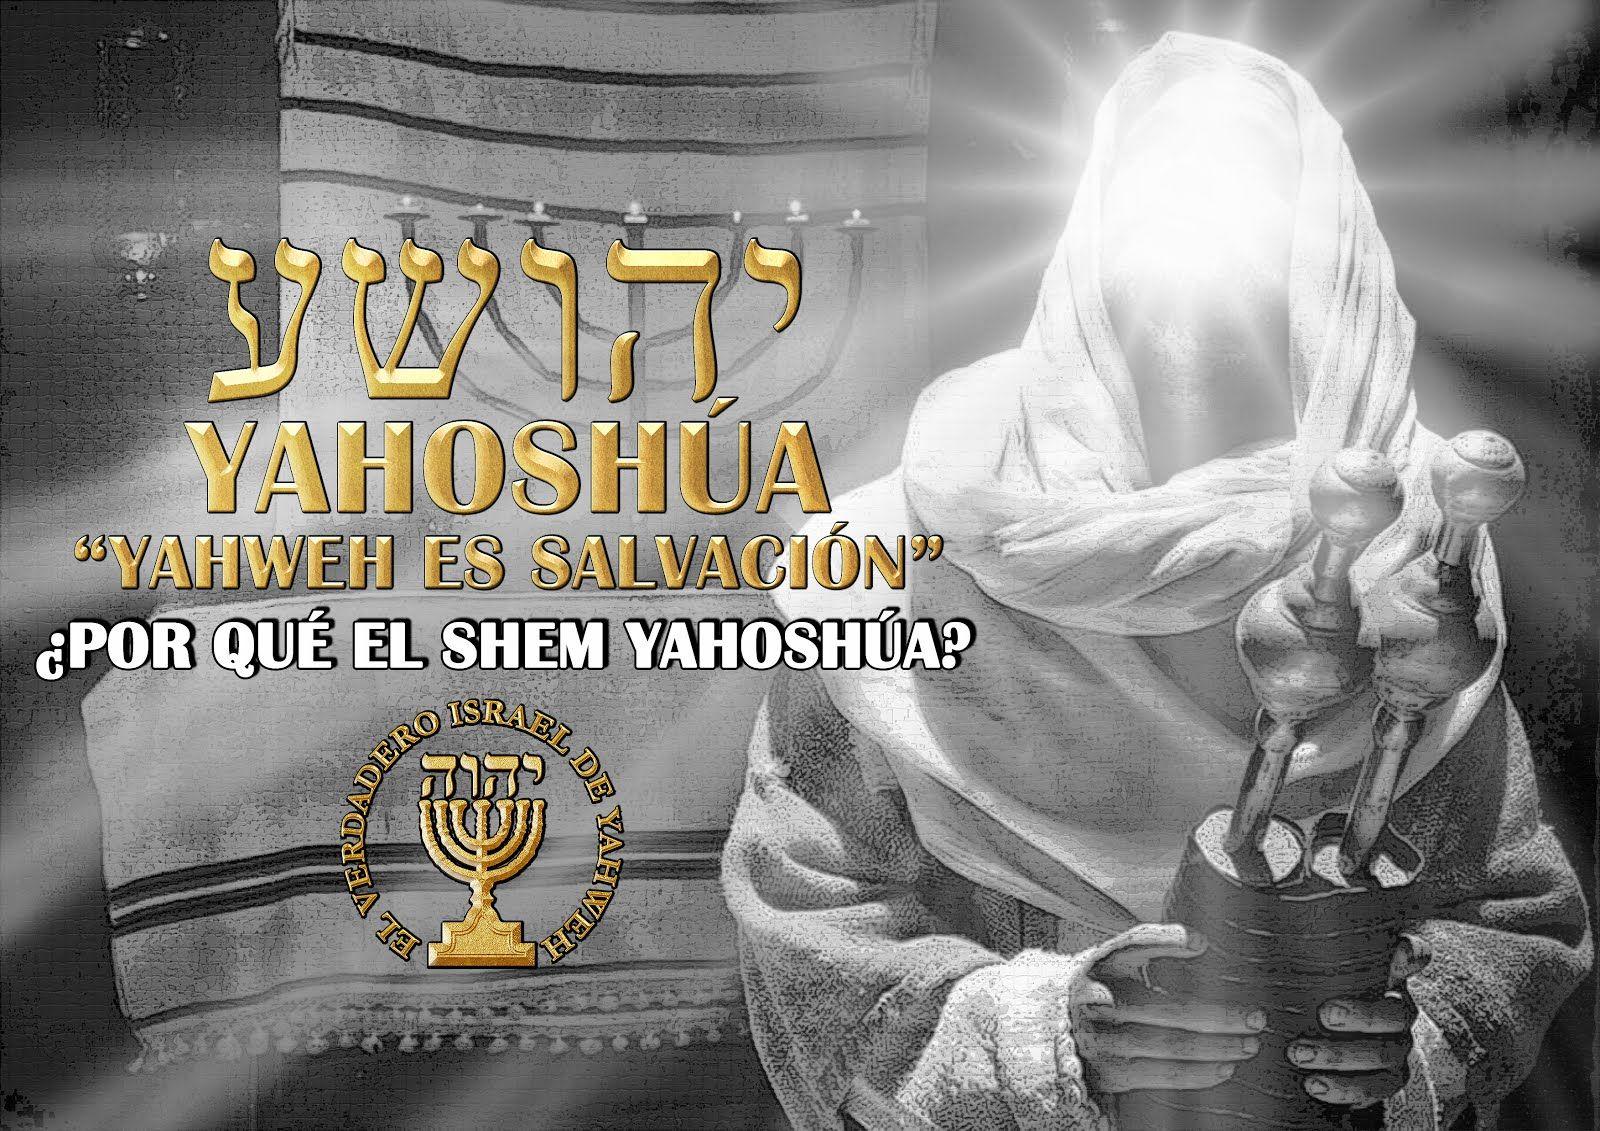 Por Que El Nombre Yahoshua Shem Mashiaj Yahoshua Yahweh Es